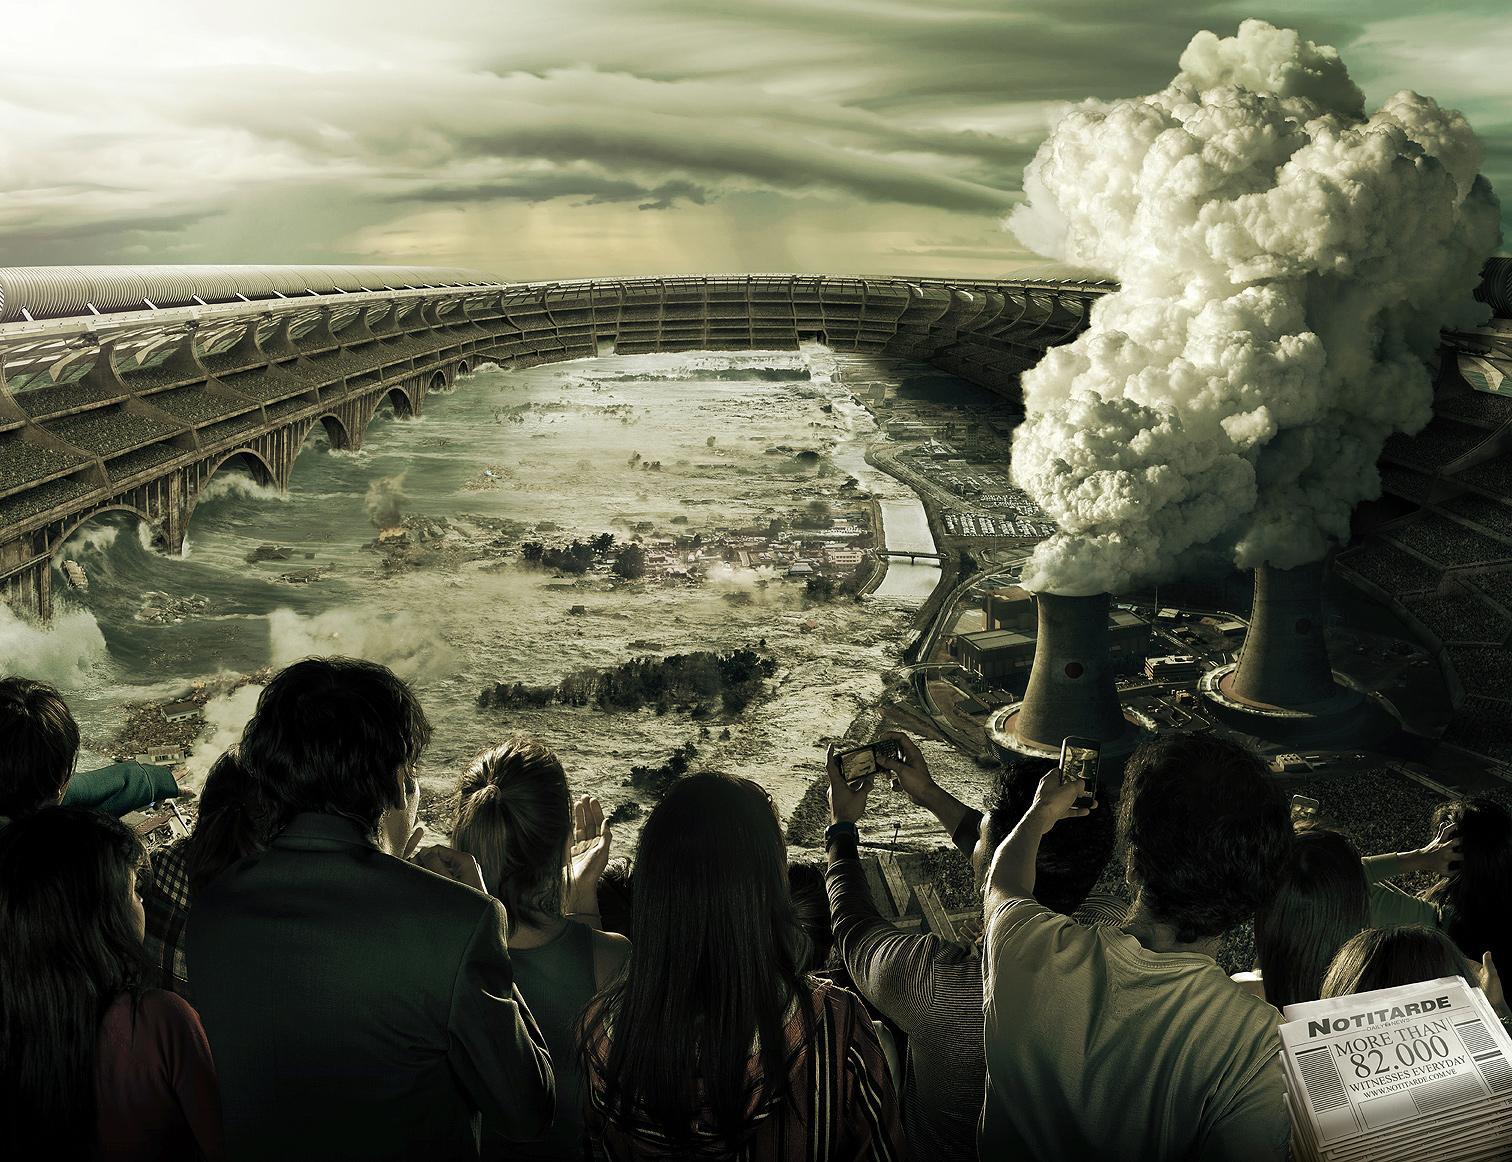 Notitarde Print Ad -  Witnesses, Tsunami